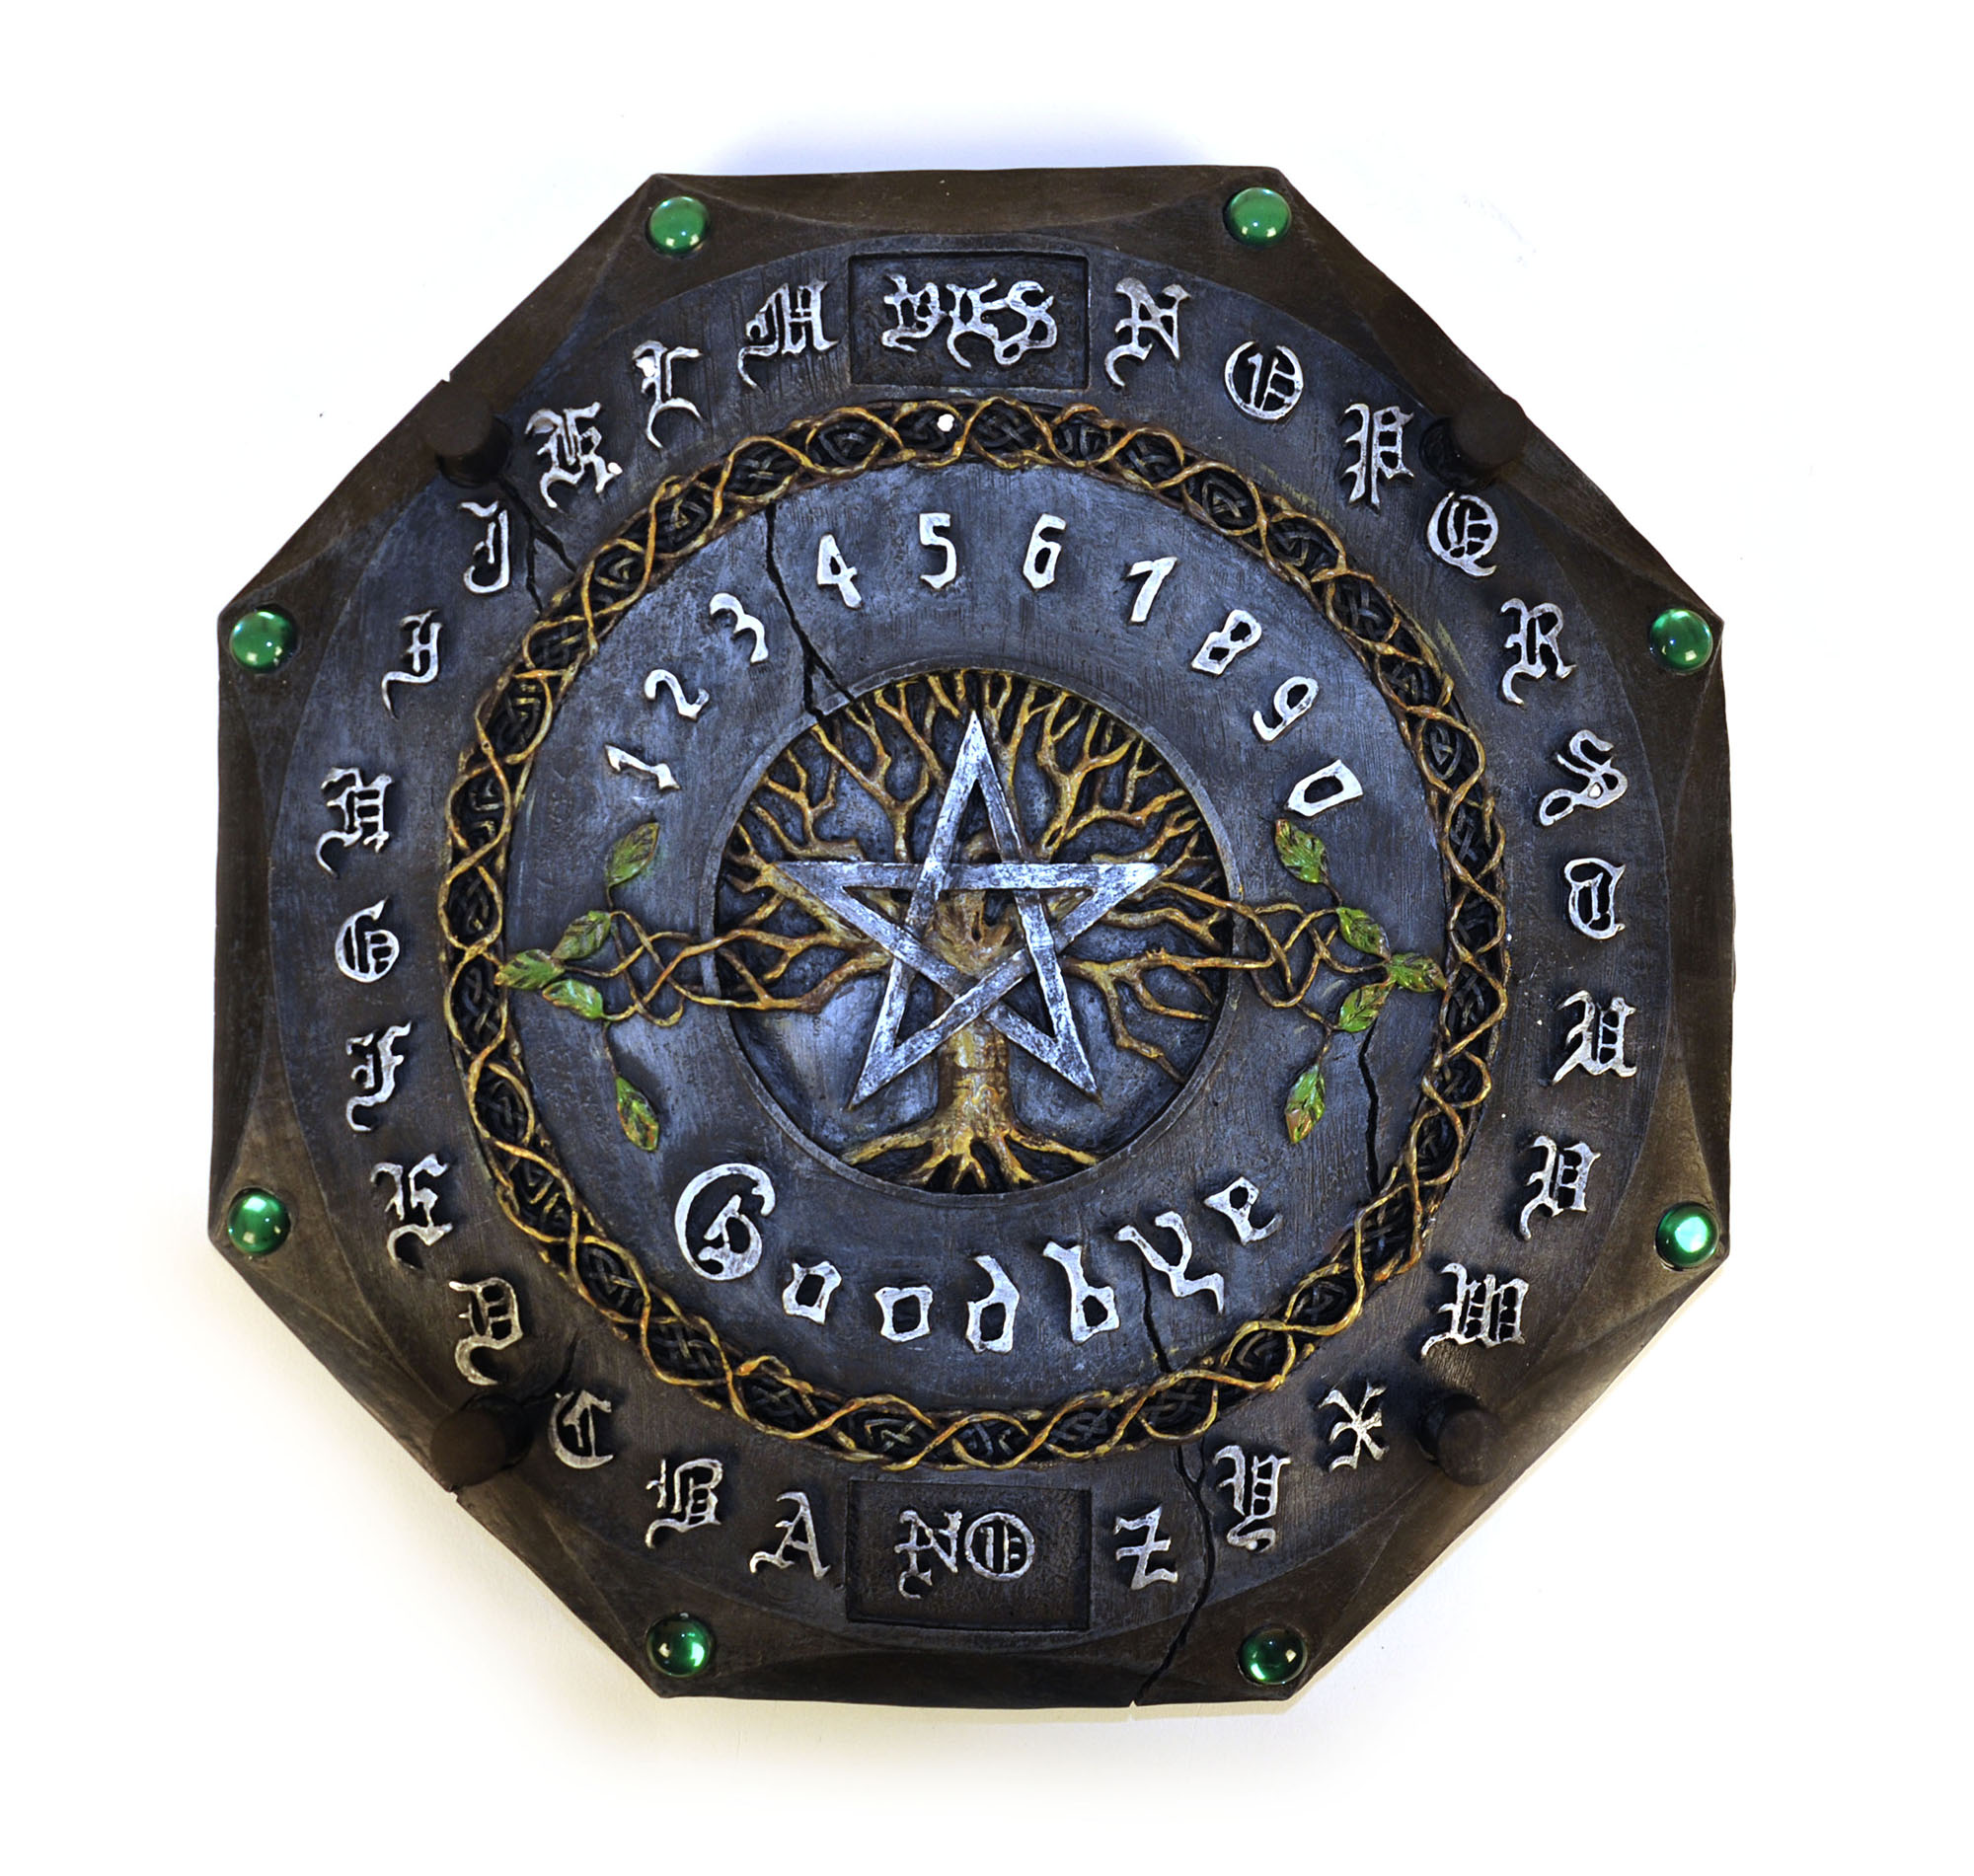 Ouija übersetzung